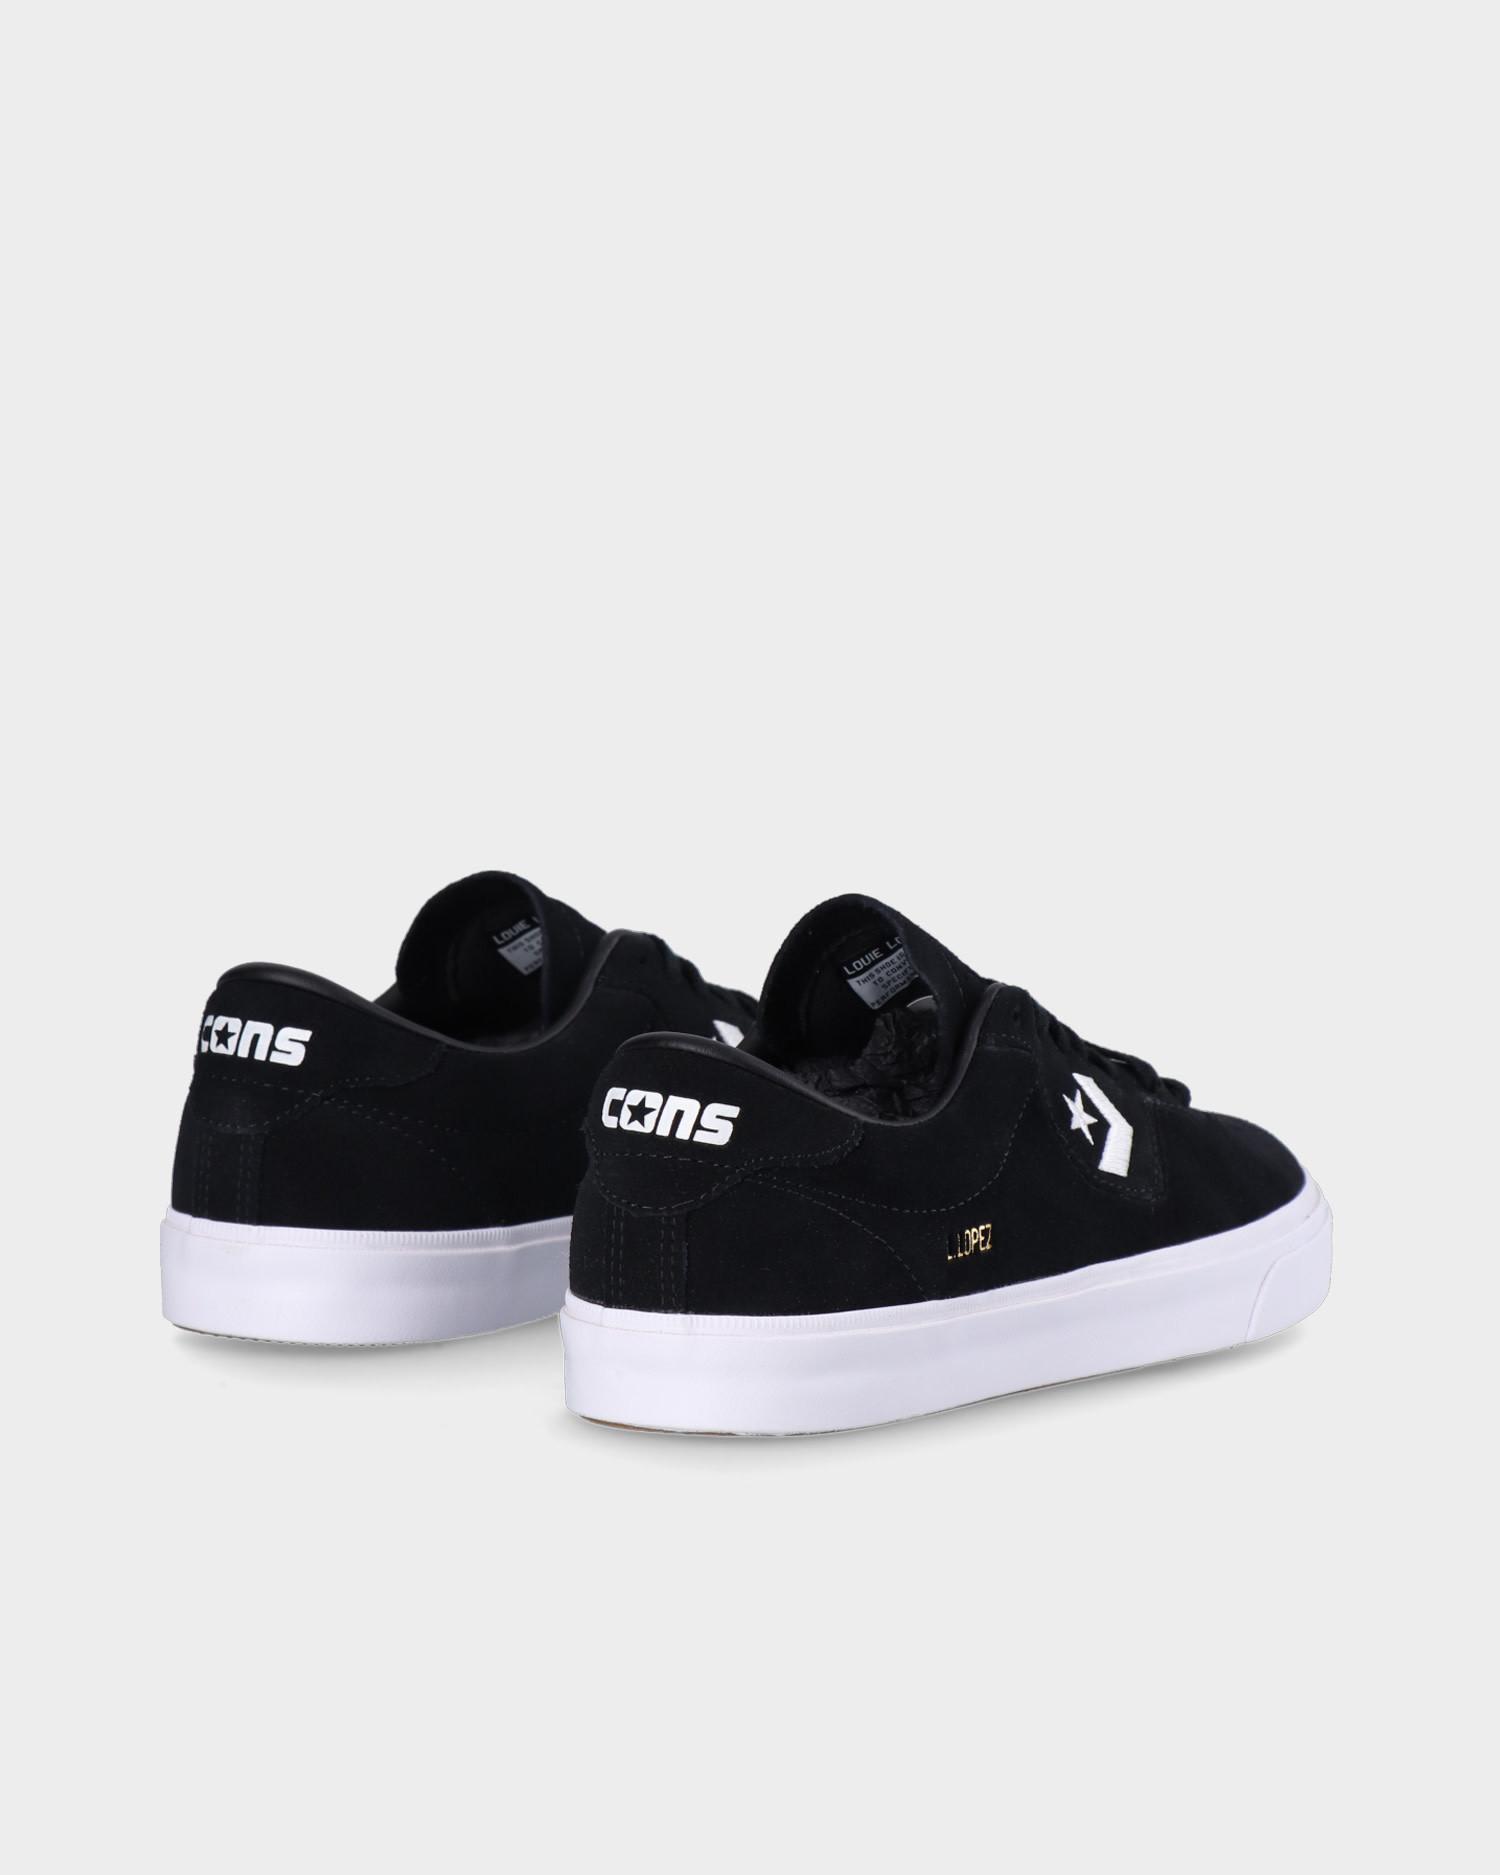 Converse Louie Lopez Pro OX Black/Black/White